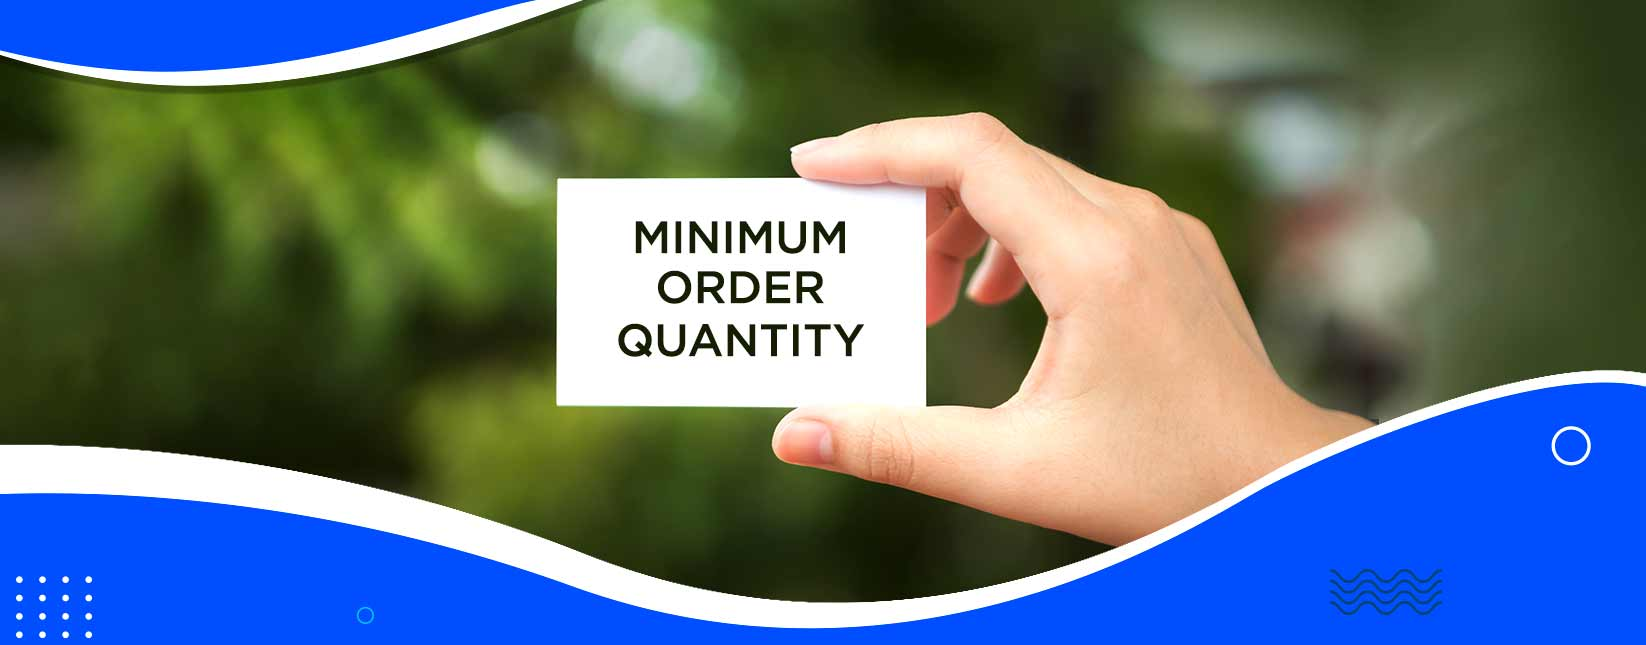 MOQ: Why China Suppliers Insist on Minimum Order Quantity